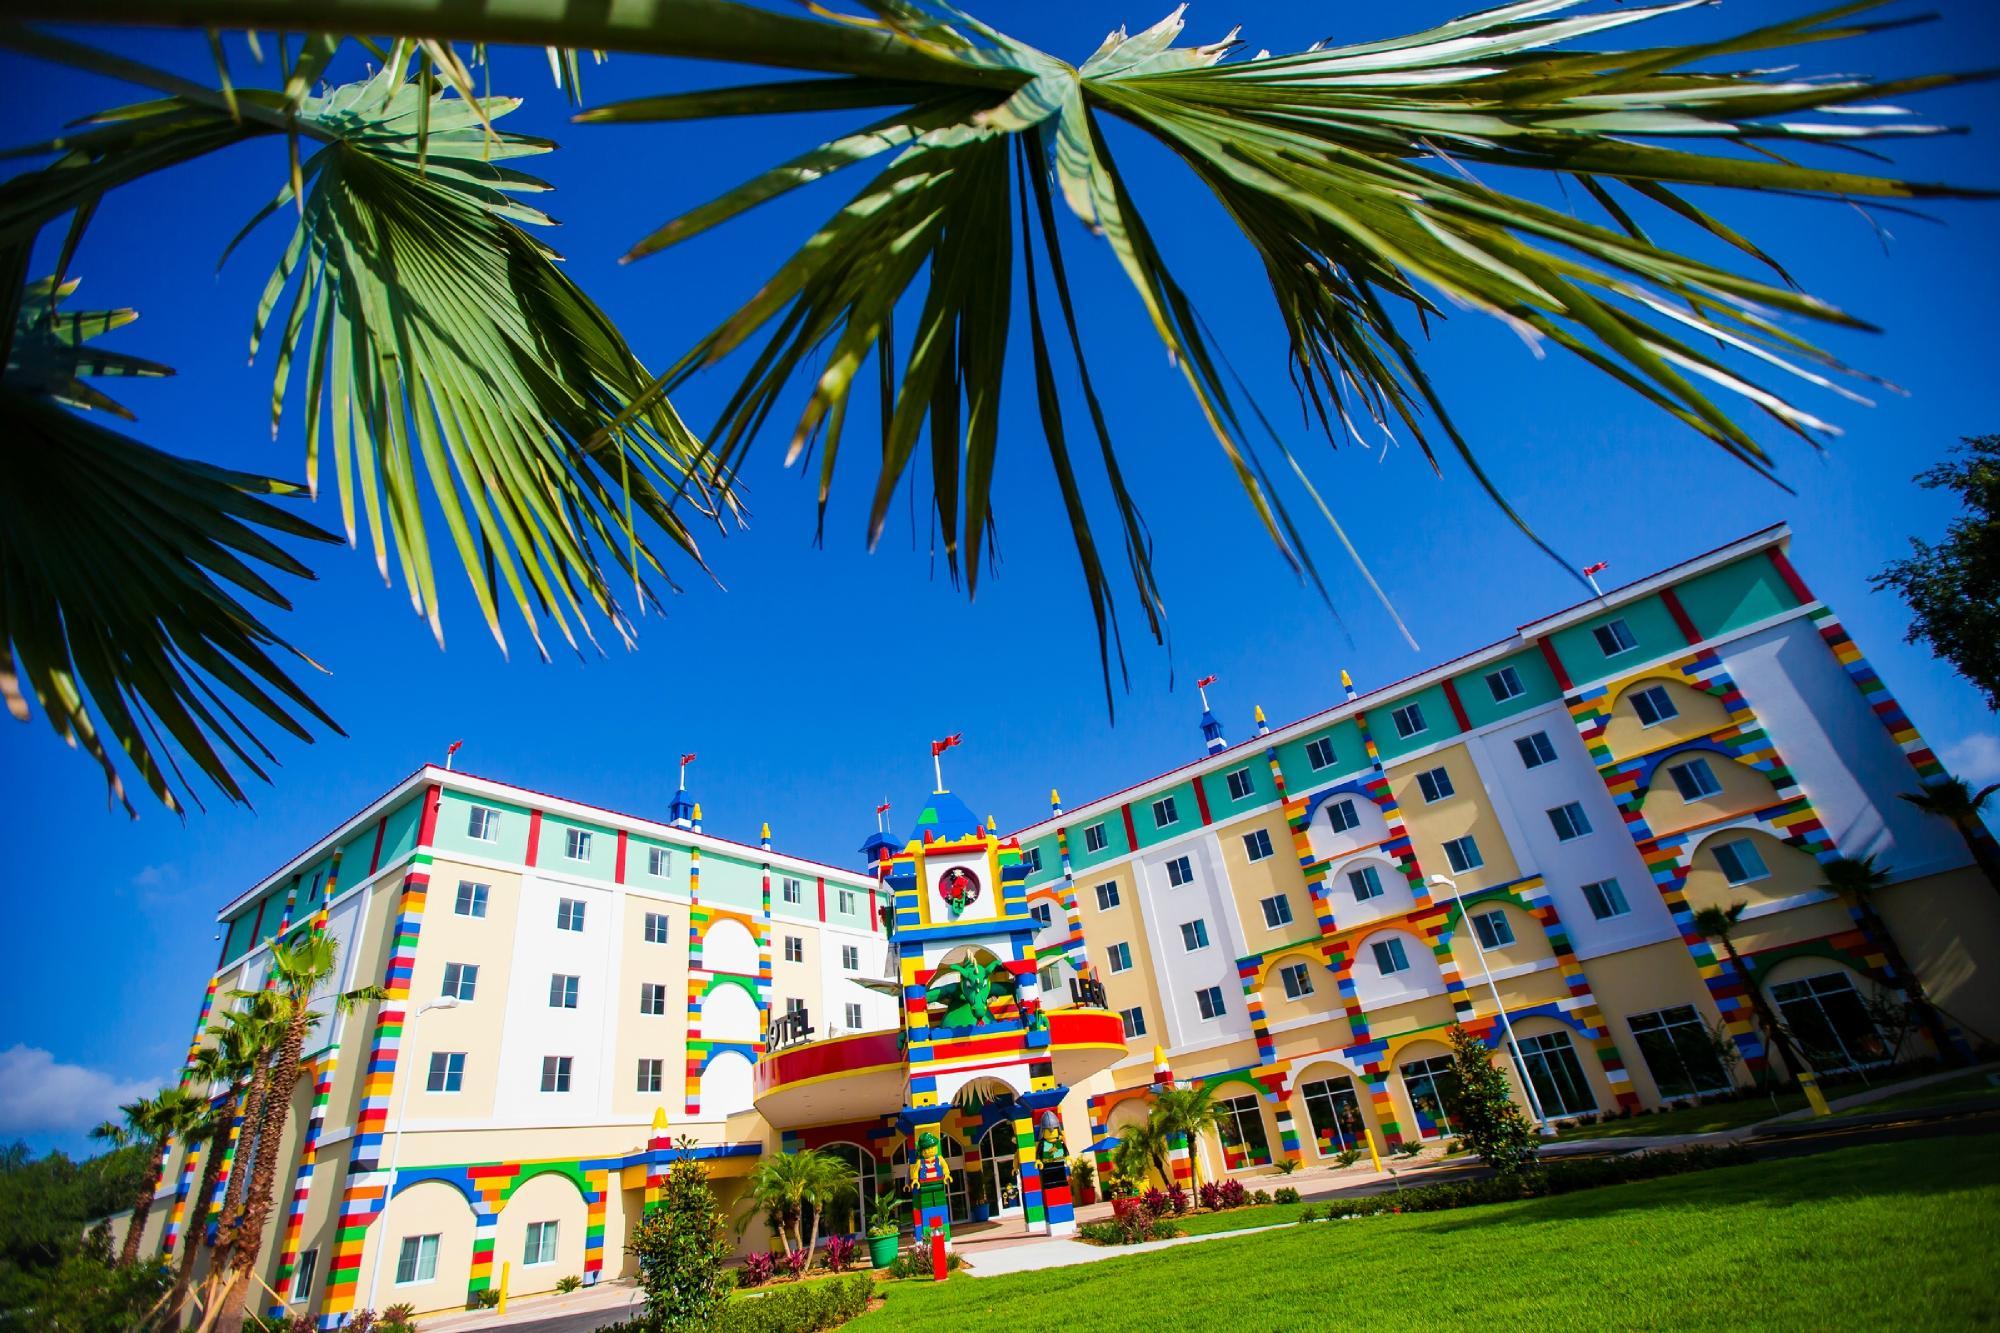 legoland florida hotel winter haven fl 2018 review family